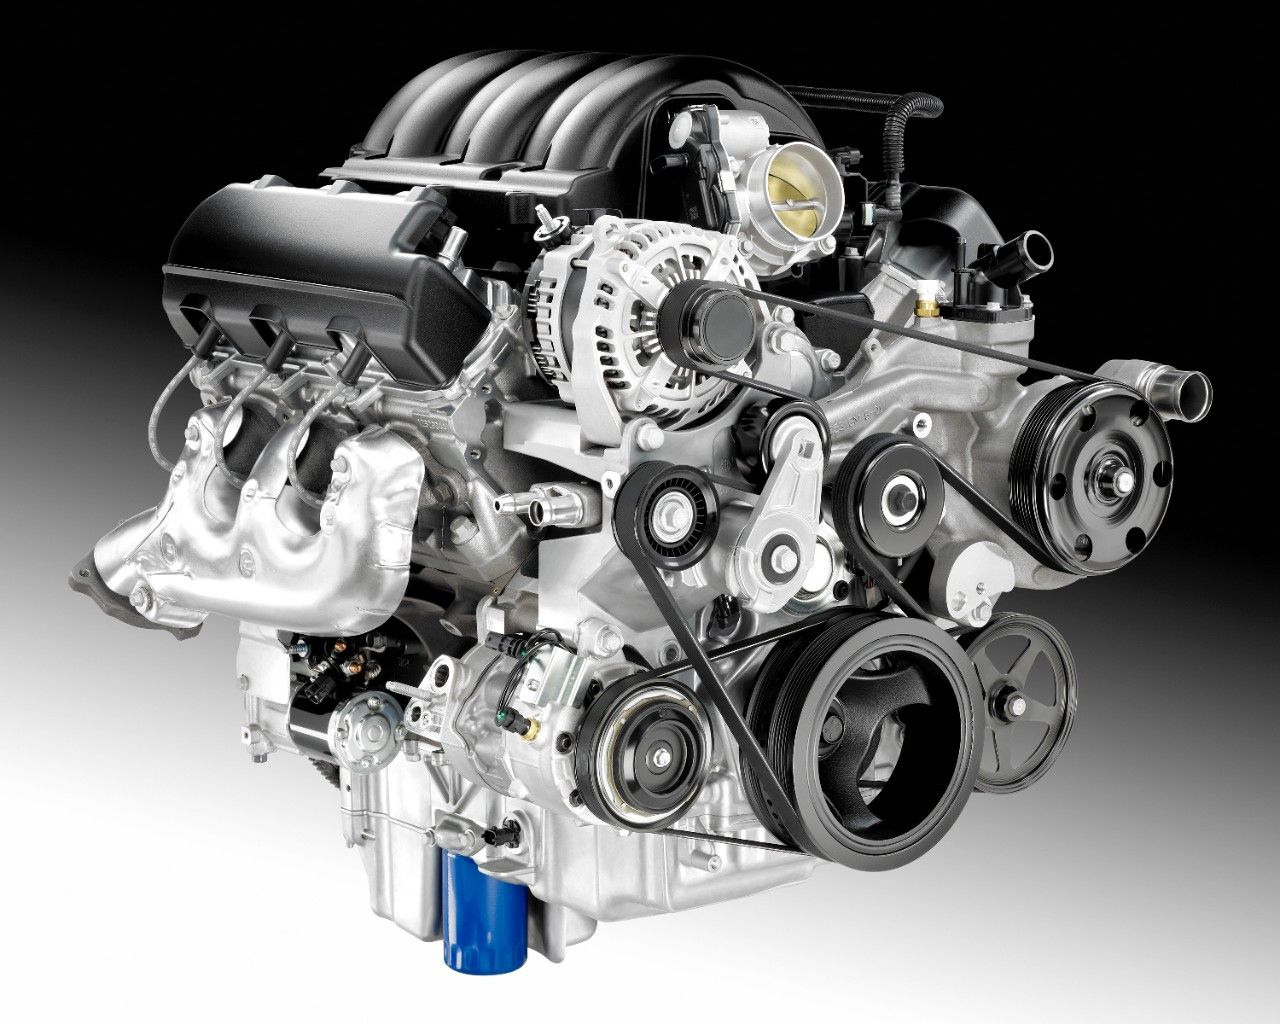 medium resolution of 2007 gm 5 3 engine diagram product wiring diagrams u2022 2008 dodge ram serpentine belt